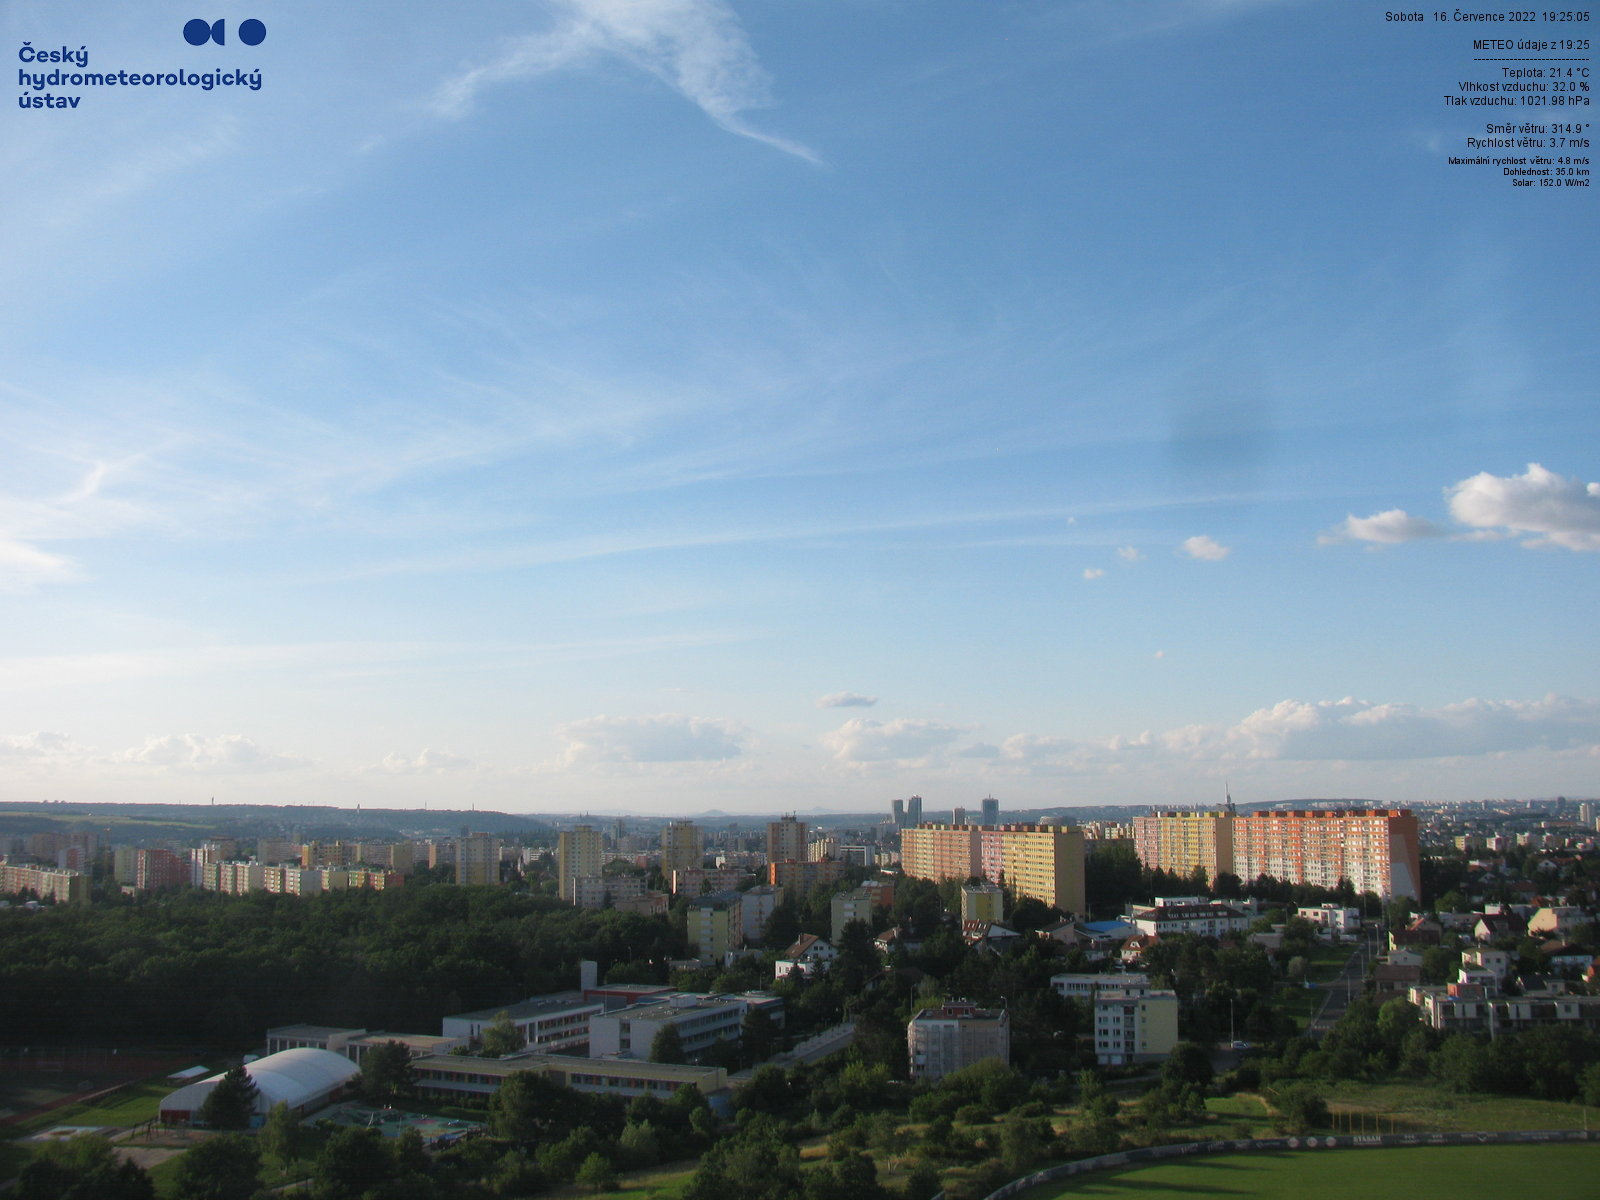 Веб-камера AMS Praha-Libuš